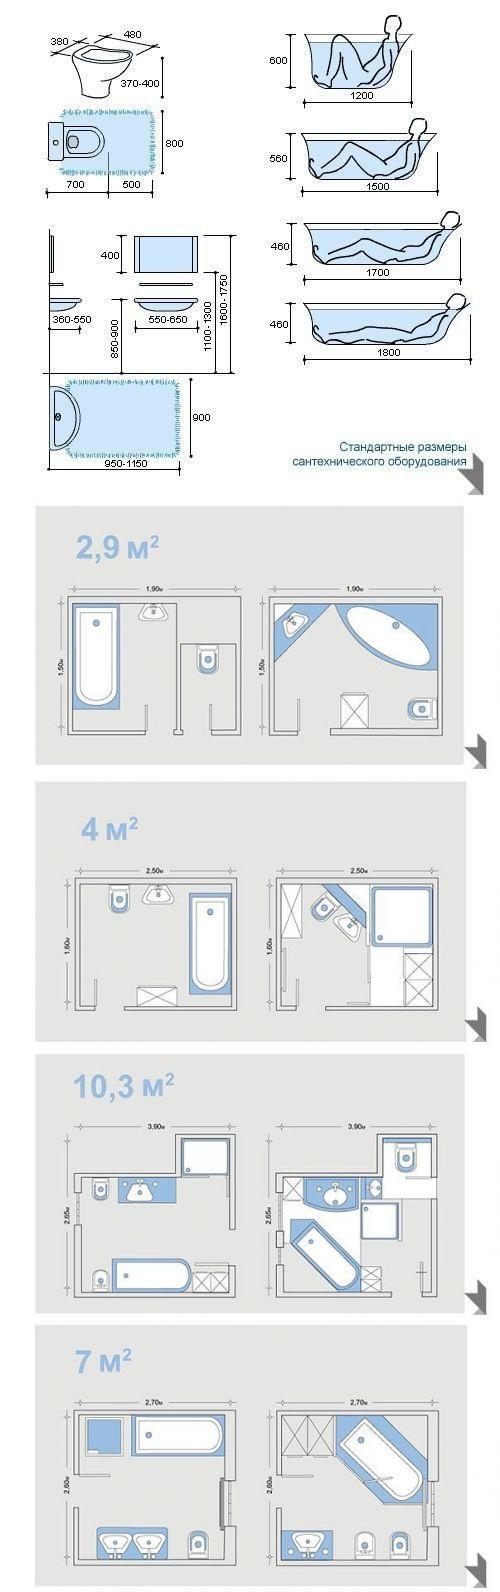 Crib on planning bathrooms, with ergonomic standards